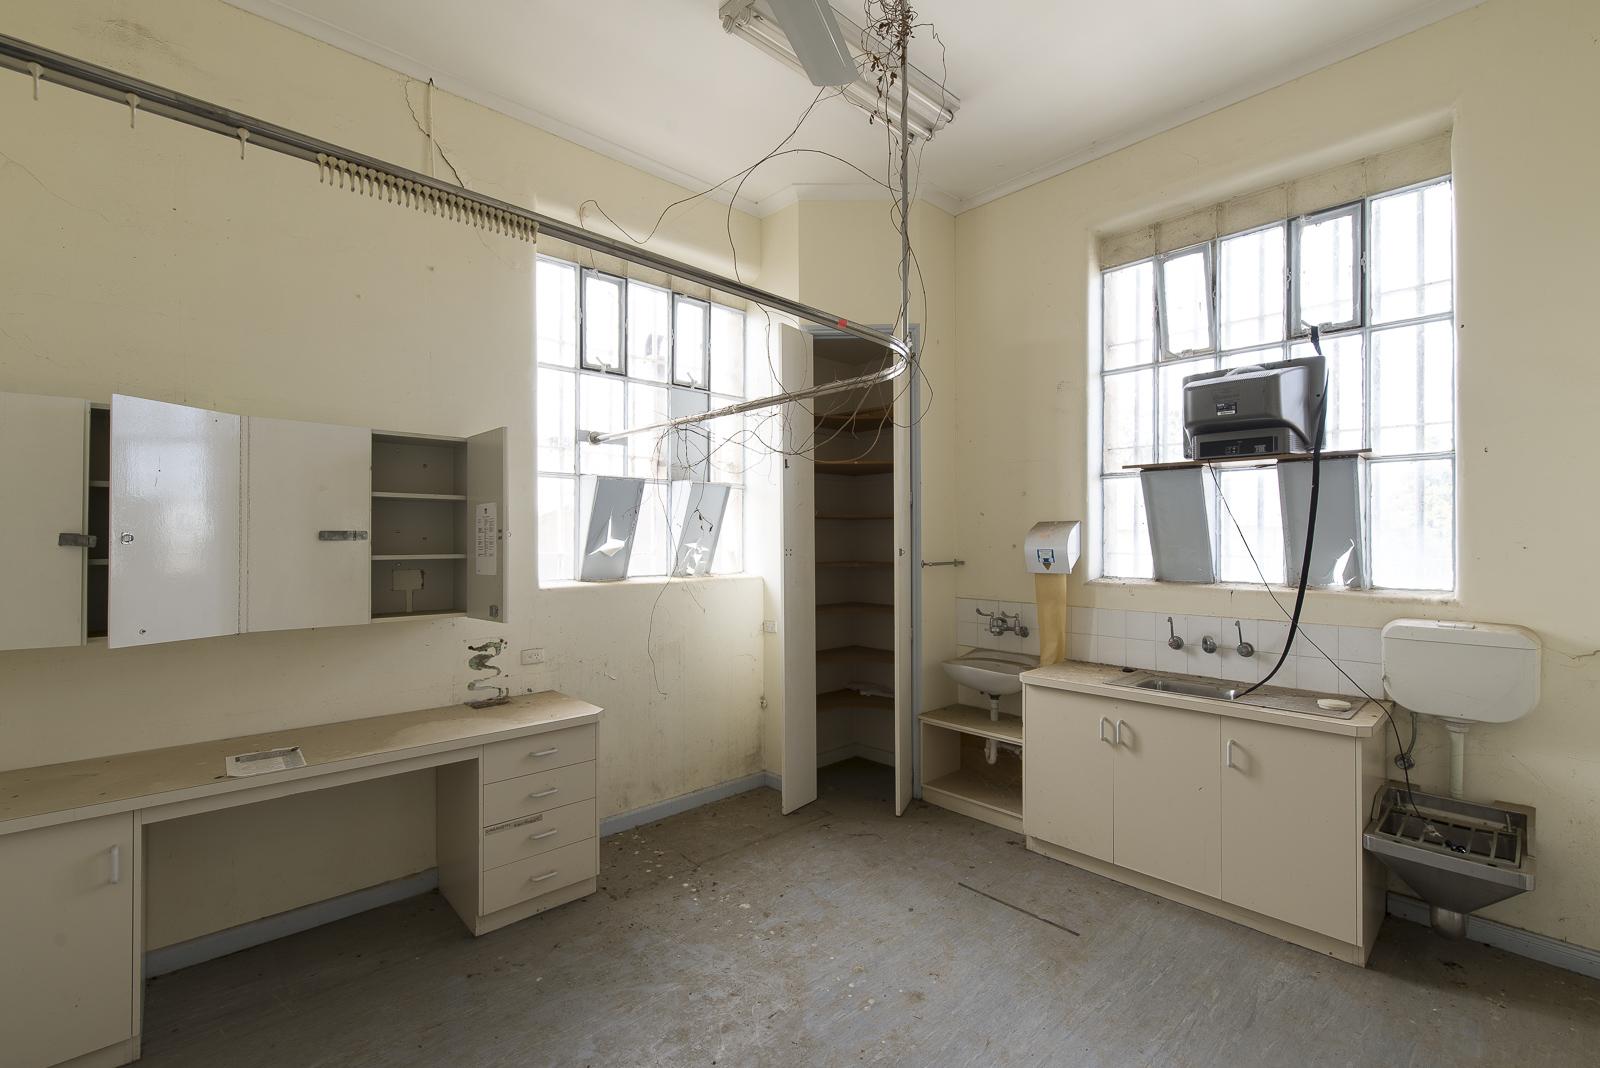 Beechworth H.M Prison 2018